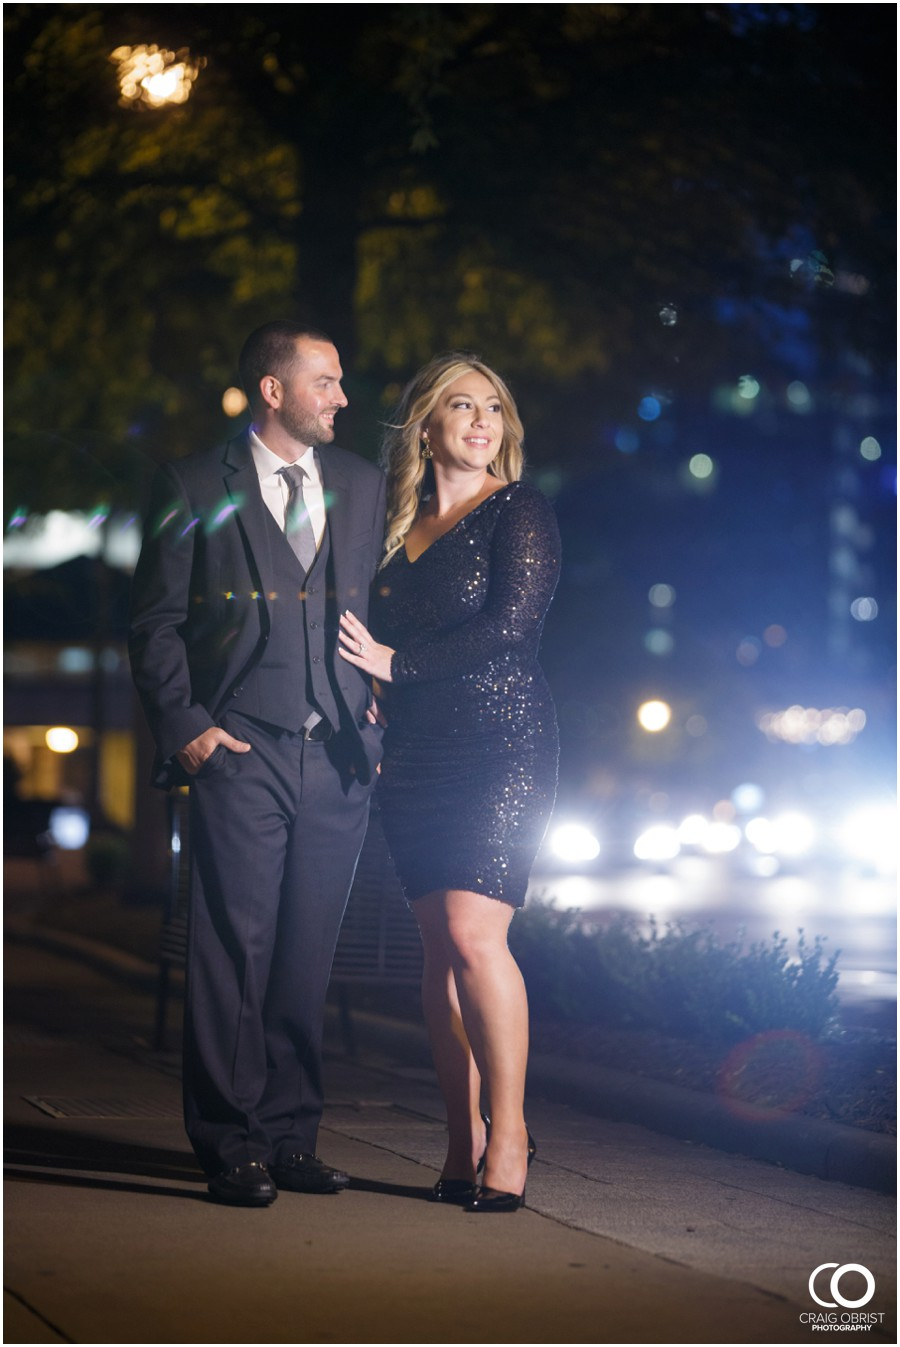 Philips-Arena-Atlanta-Buckhead-City-Engagement-Portraits_0024.jpg